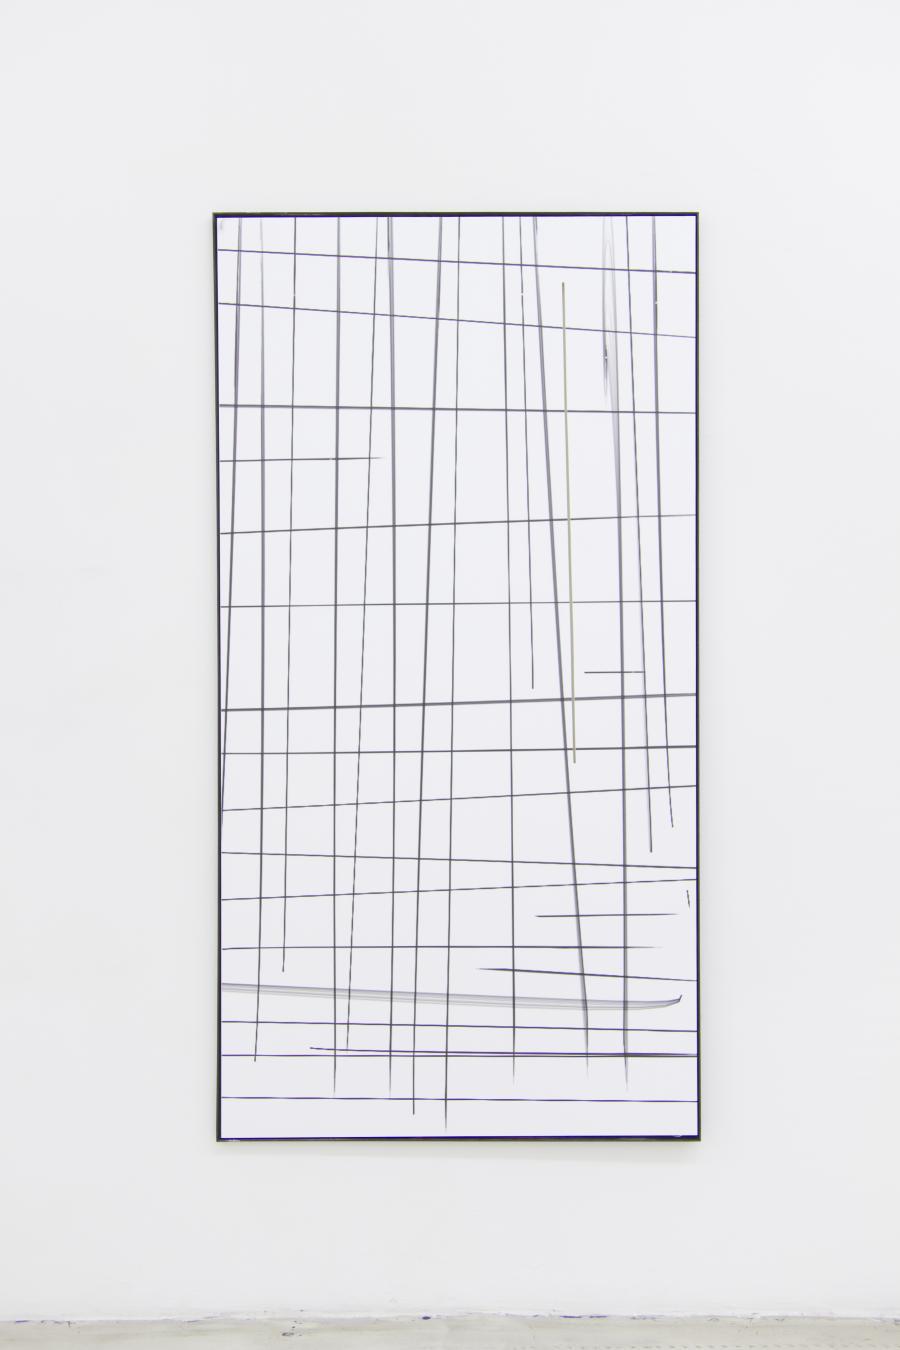 Marina Sula, Drawing - metro, tablet drawing, UV-print on PVC, laser cut, steel, 172 x 89, 2015